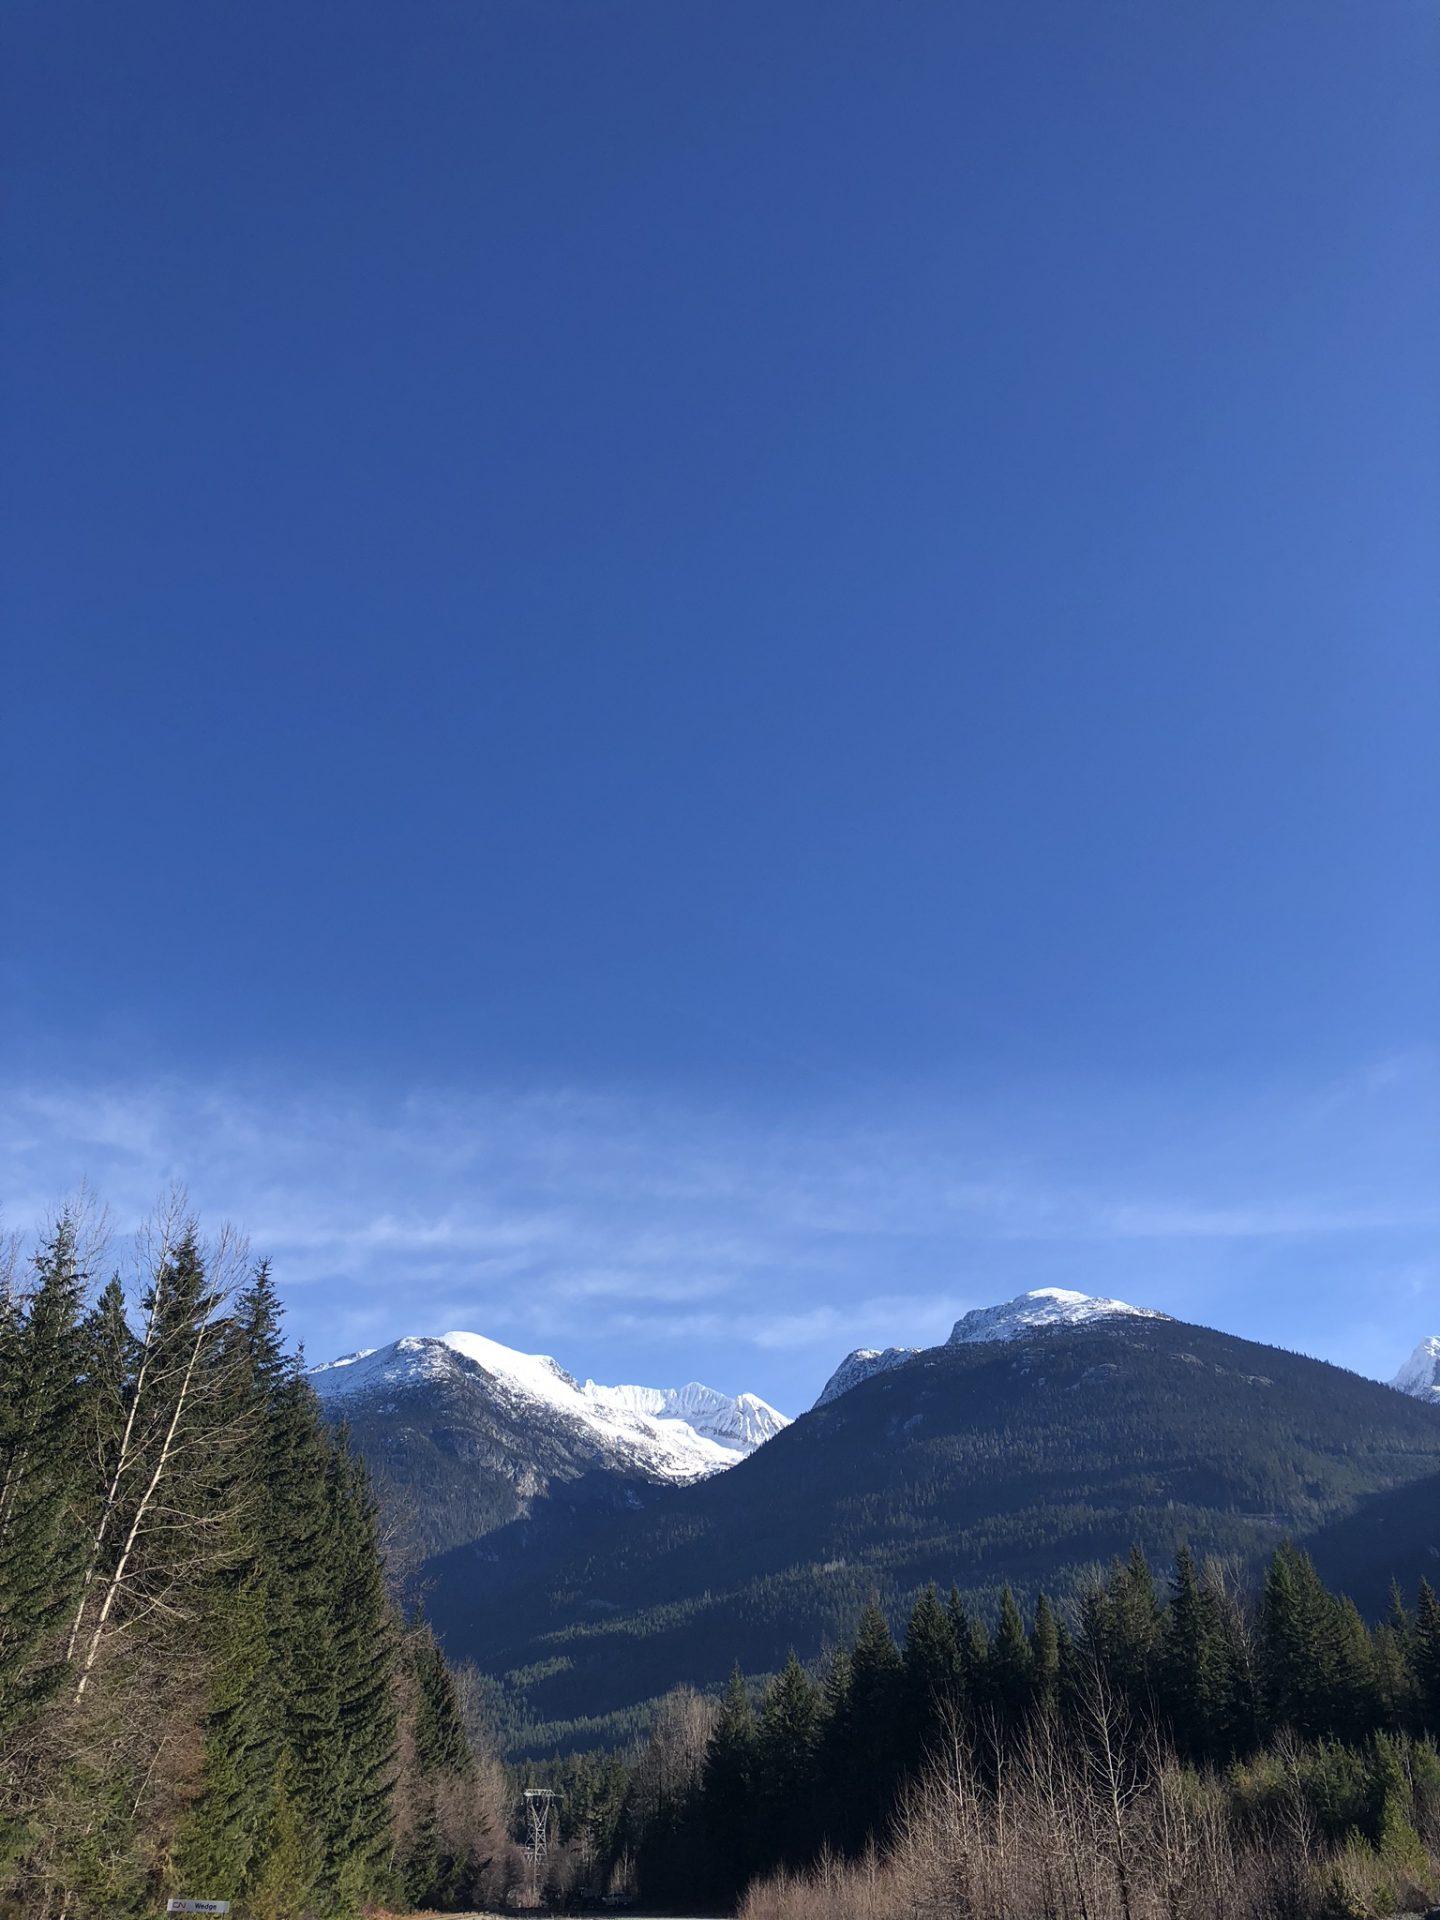 Beautiful mountain view near Whistler, British Columbia